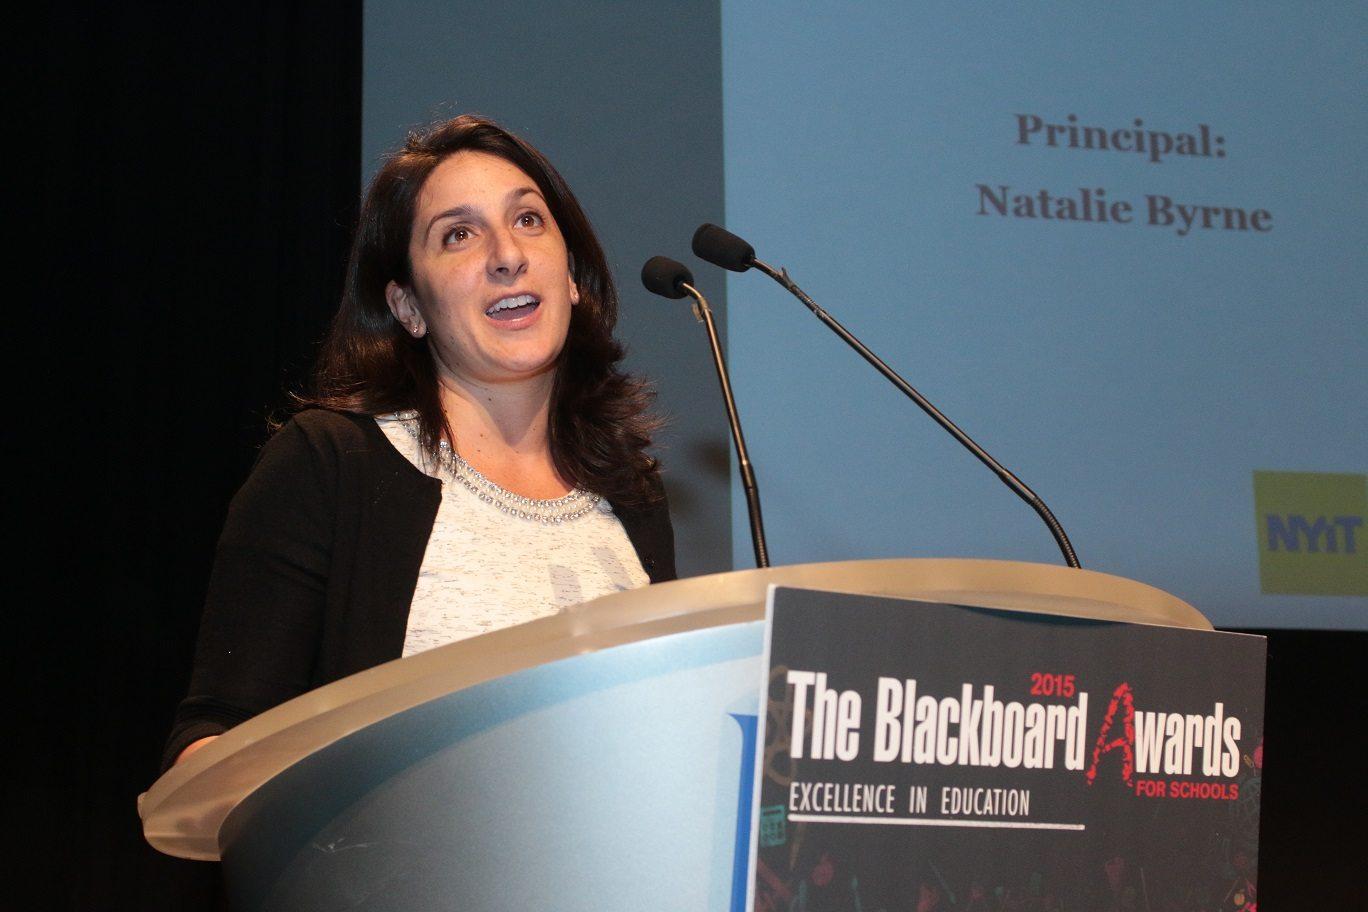 Natalie Byrne, Principal, KIPP NYC College Prep High School